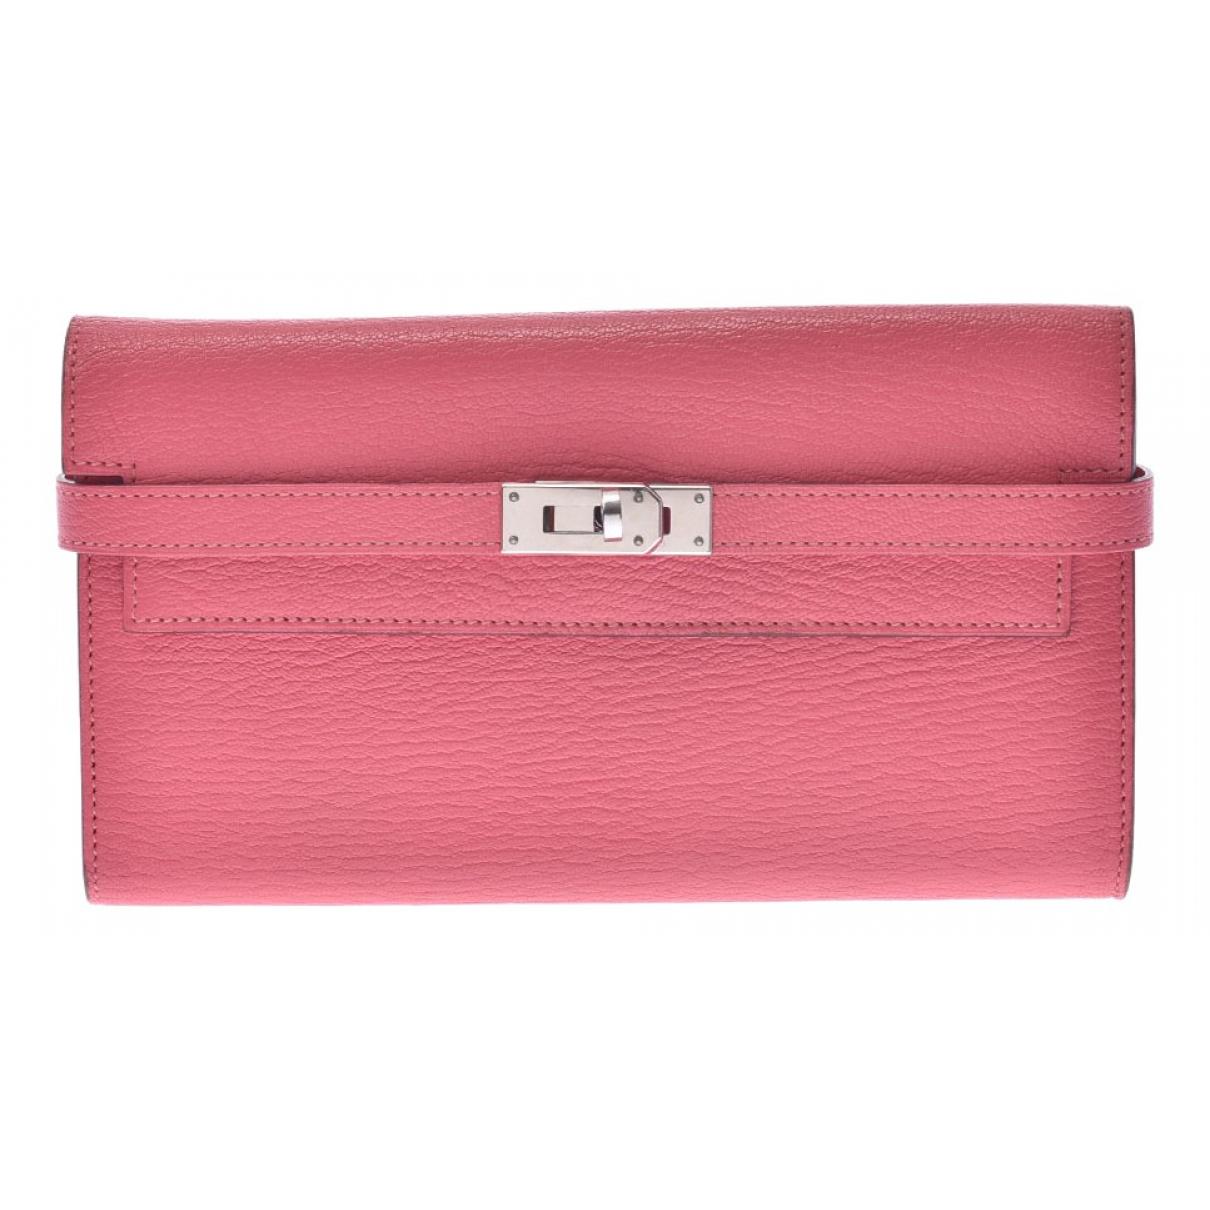 Hermes - Portefeuille Kelly pour femme en cuir - rose